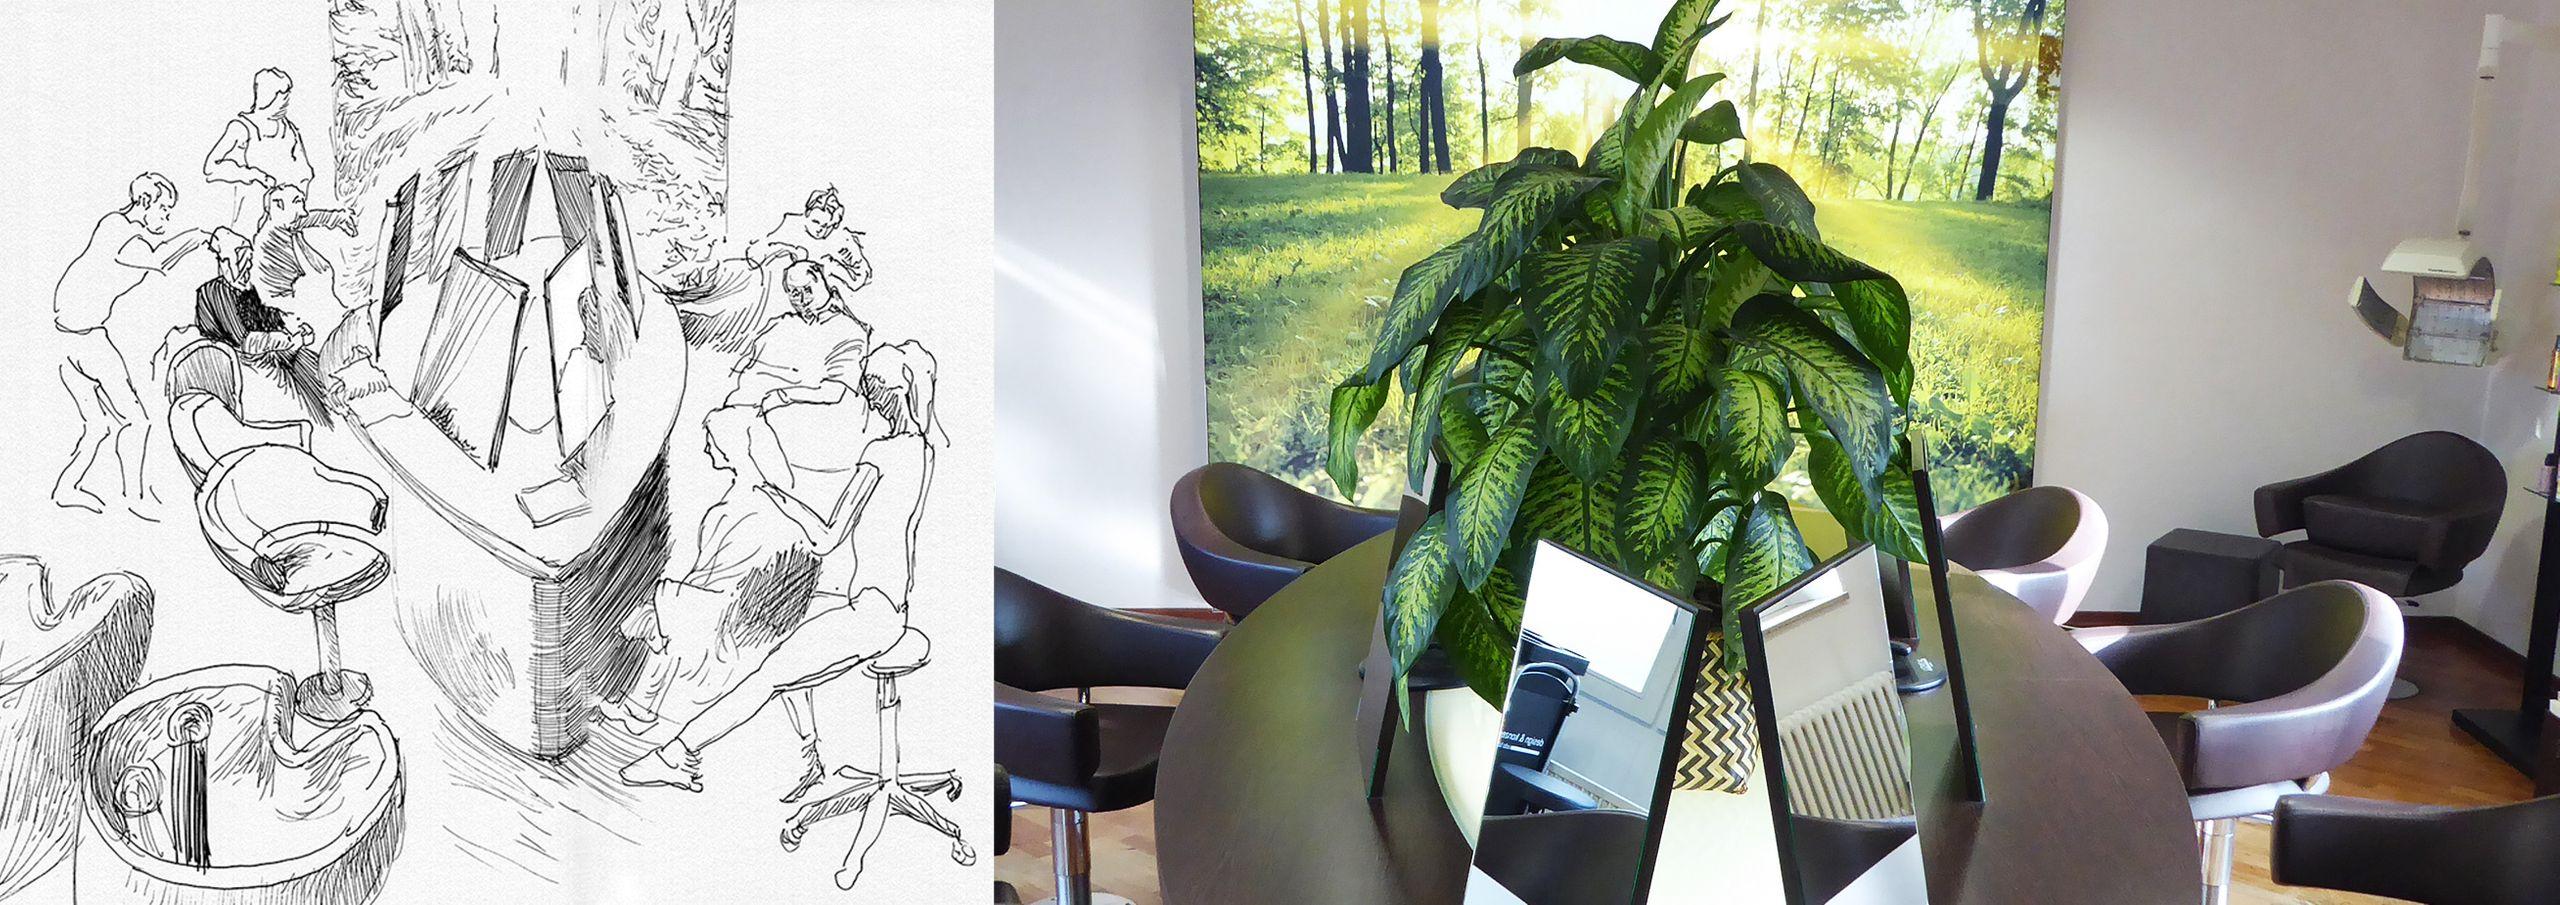 Ihr Friseur Team Udo Böing Design Konzept